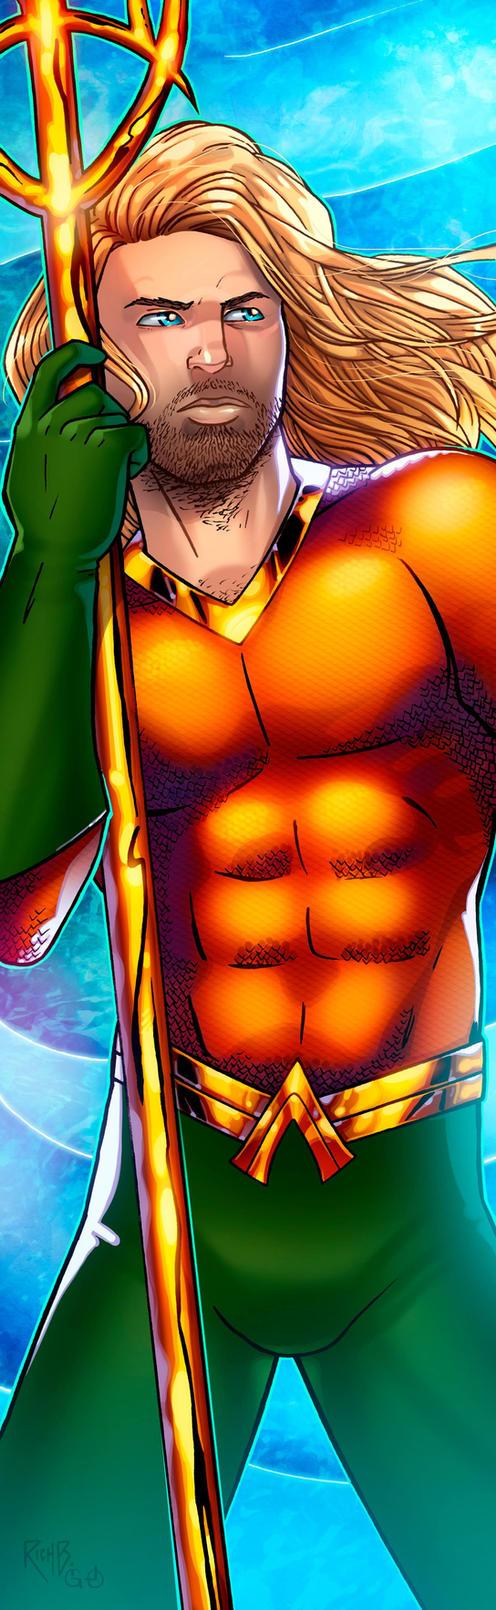 Aquaman Panel Art 2 by RichBernatovech